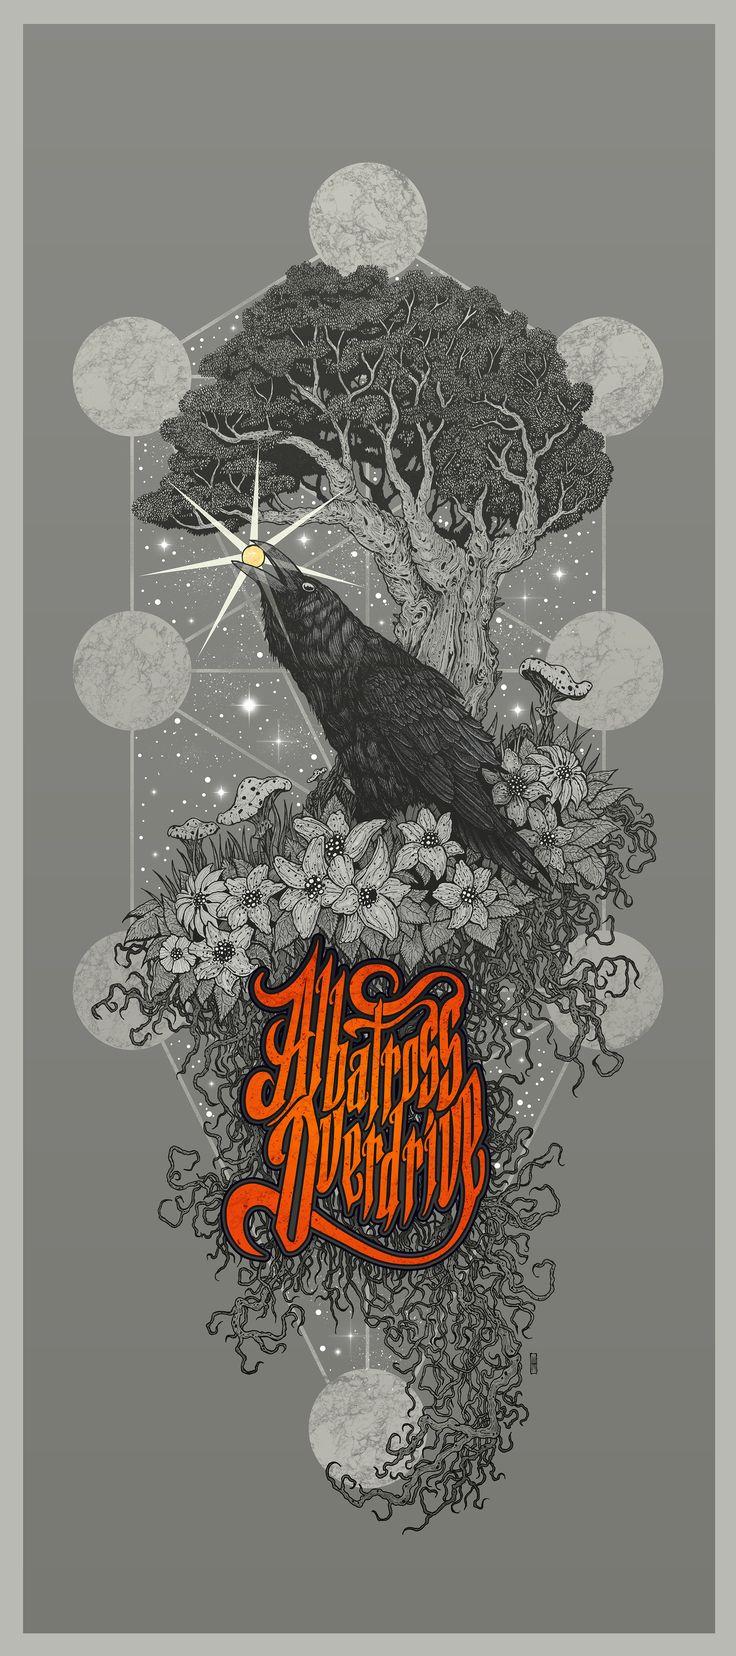 Albatross Overdrive (US) - band artwork -  monochrome version #stonerrock #posterartwork #raven #mihaimanescu #penandink #treeoflife #symbolism